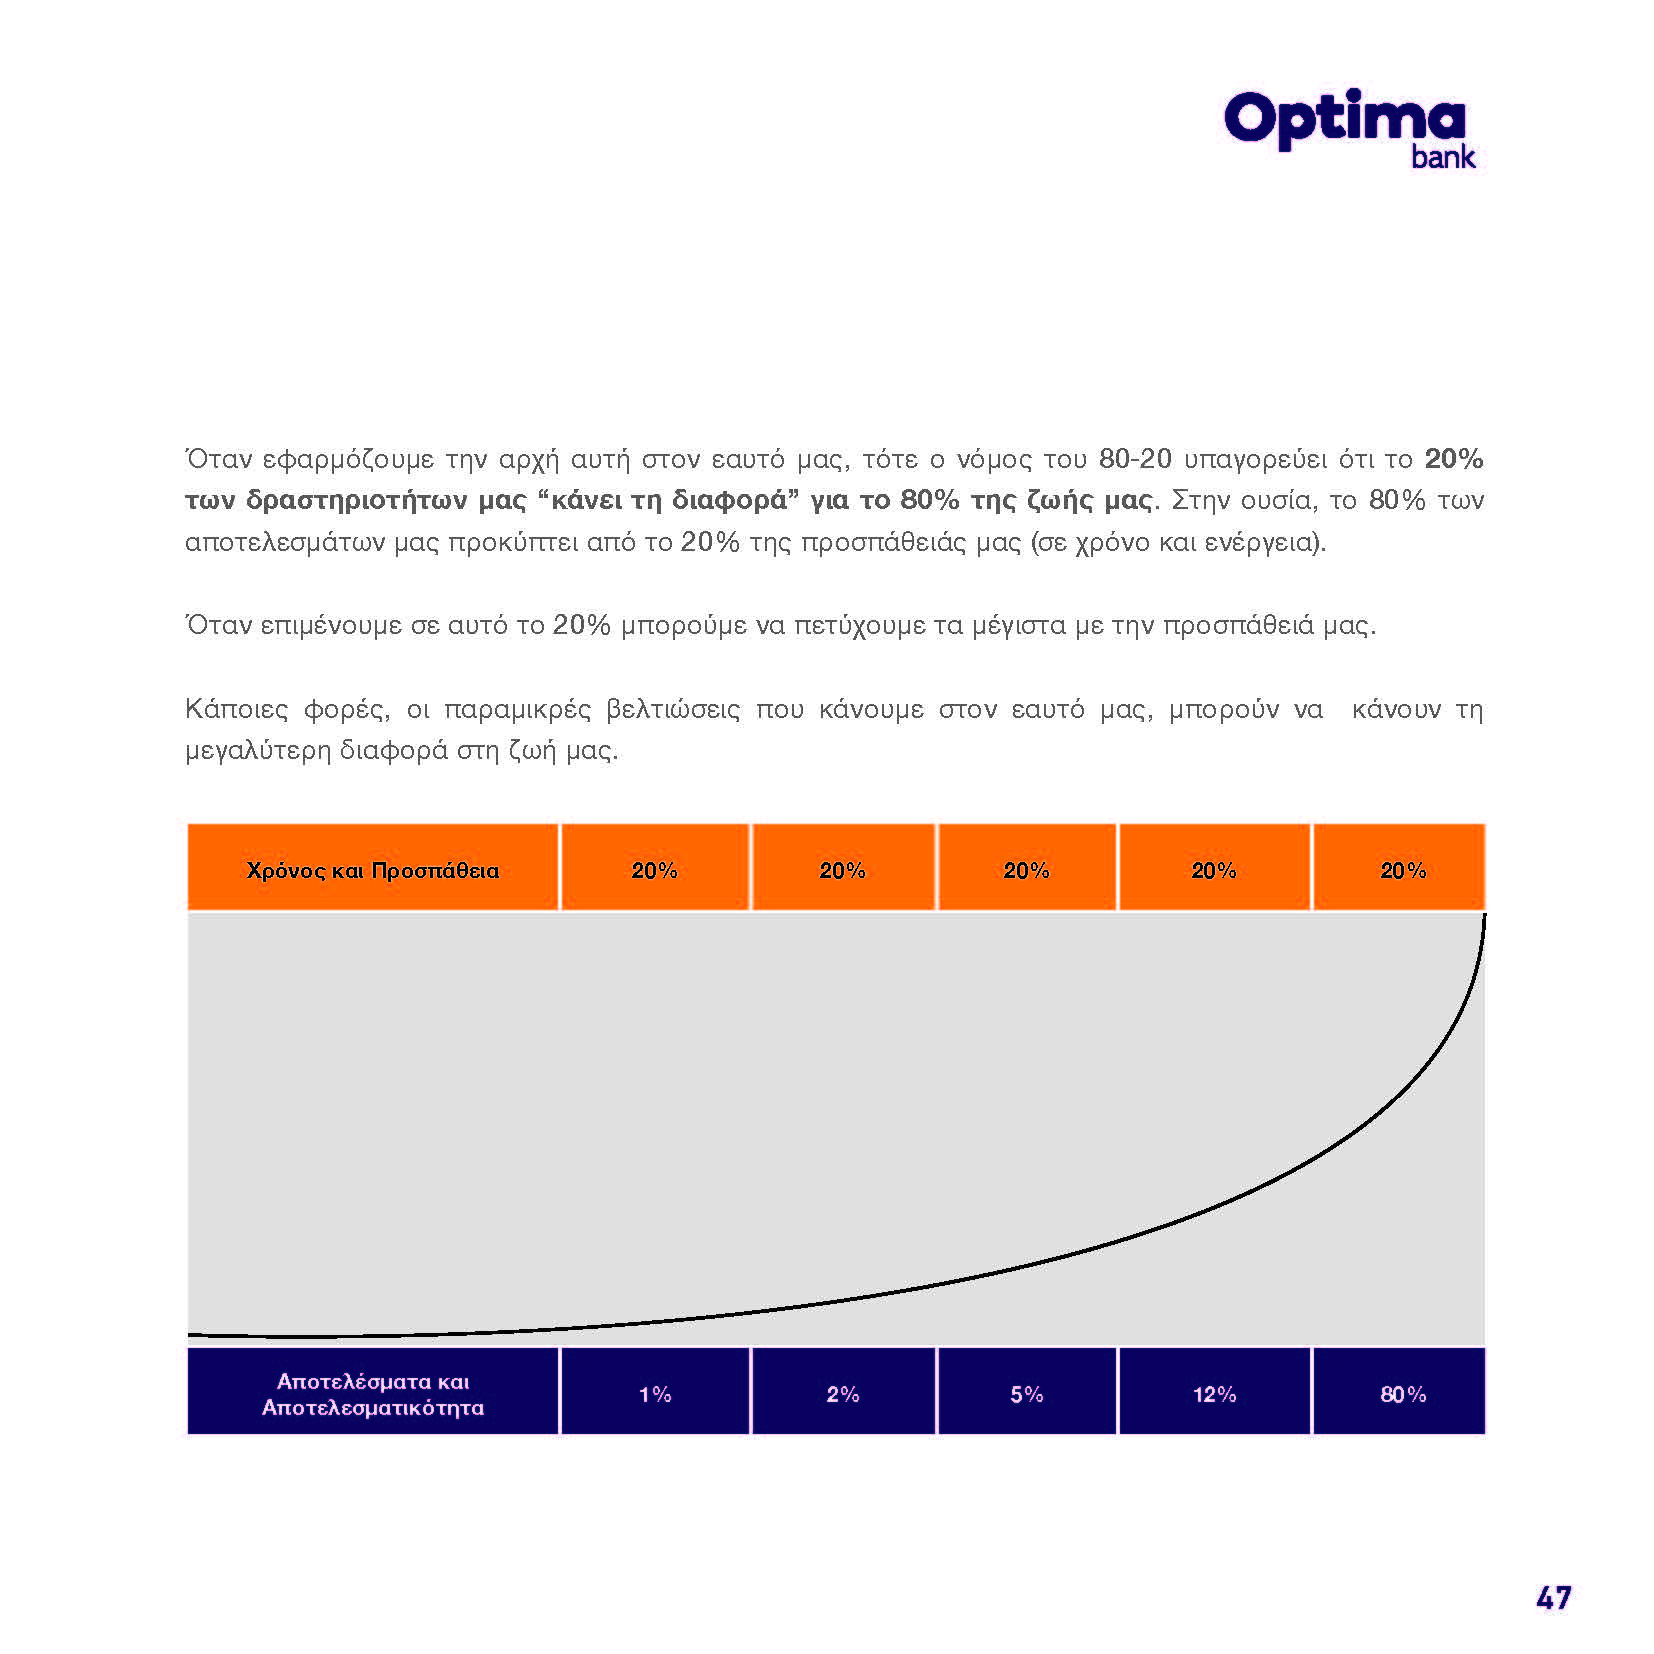 https://www.jib.gr/wp-content/uploads/2020/09/OPTIMA-BANK-BOOKLET-WEB_Page_047.jpg